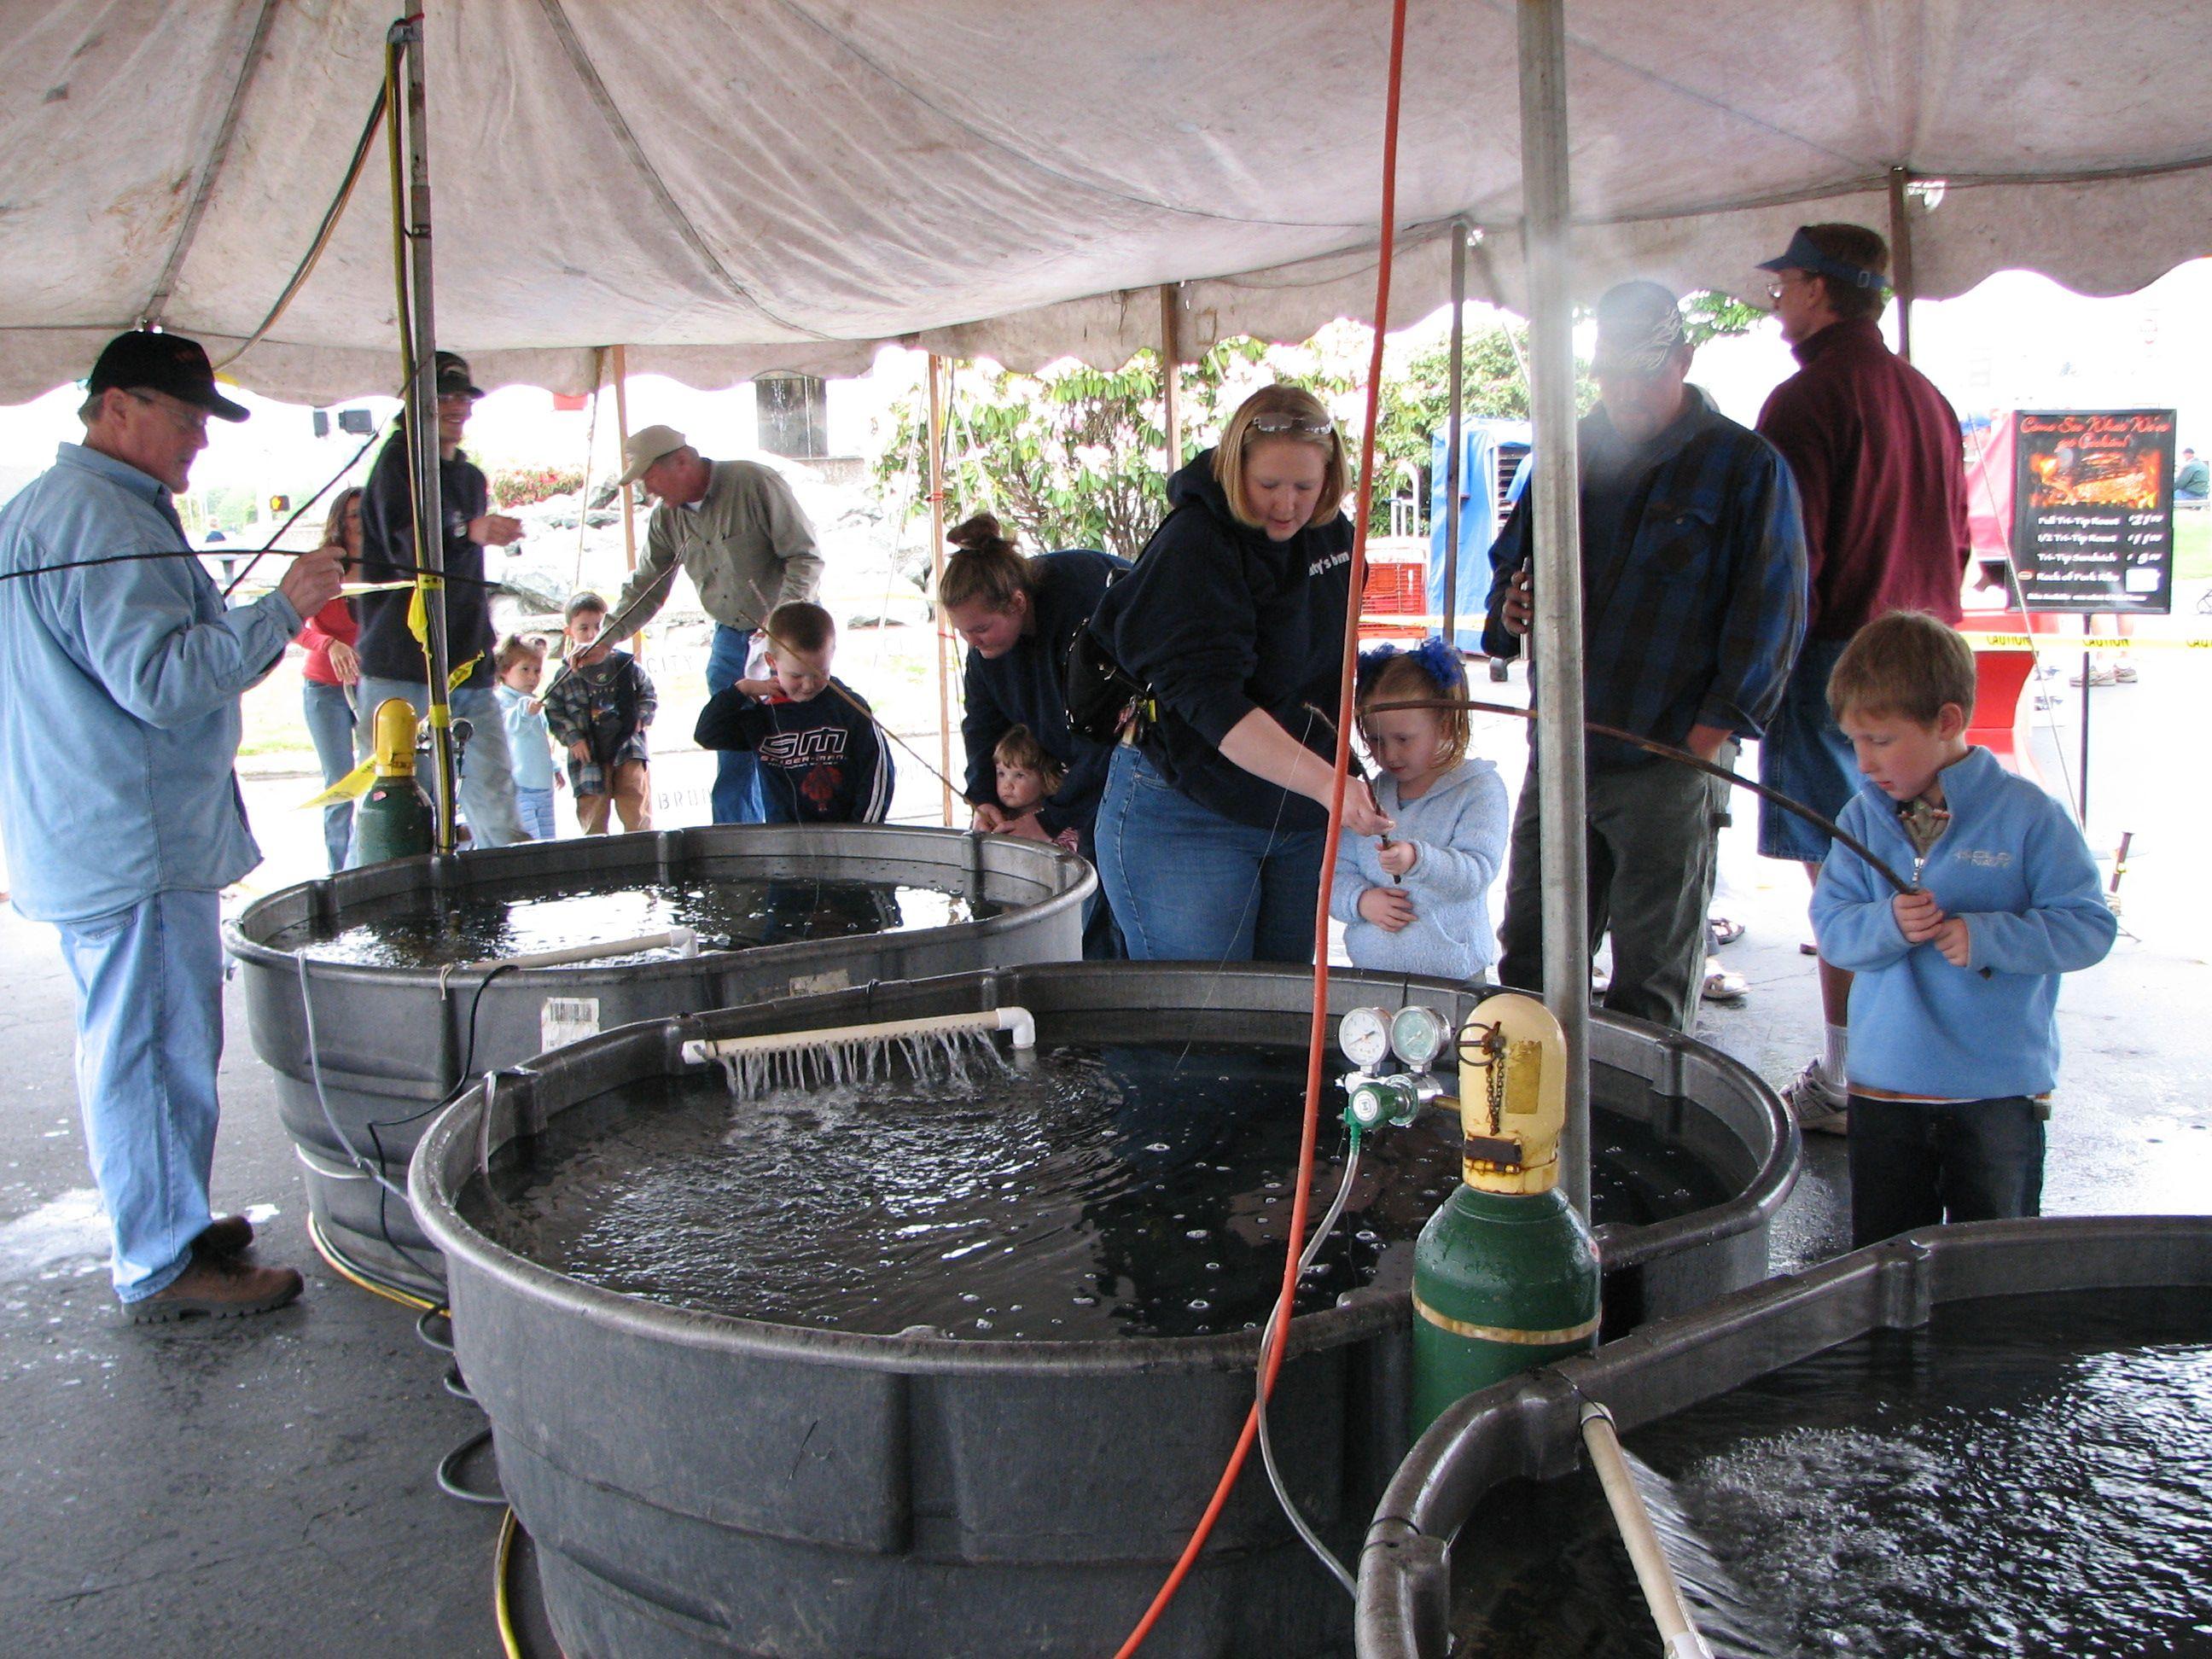 OSCF members helping kid's at the Azalea festival in